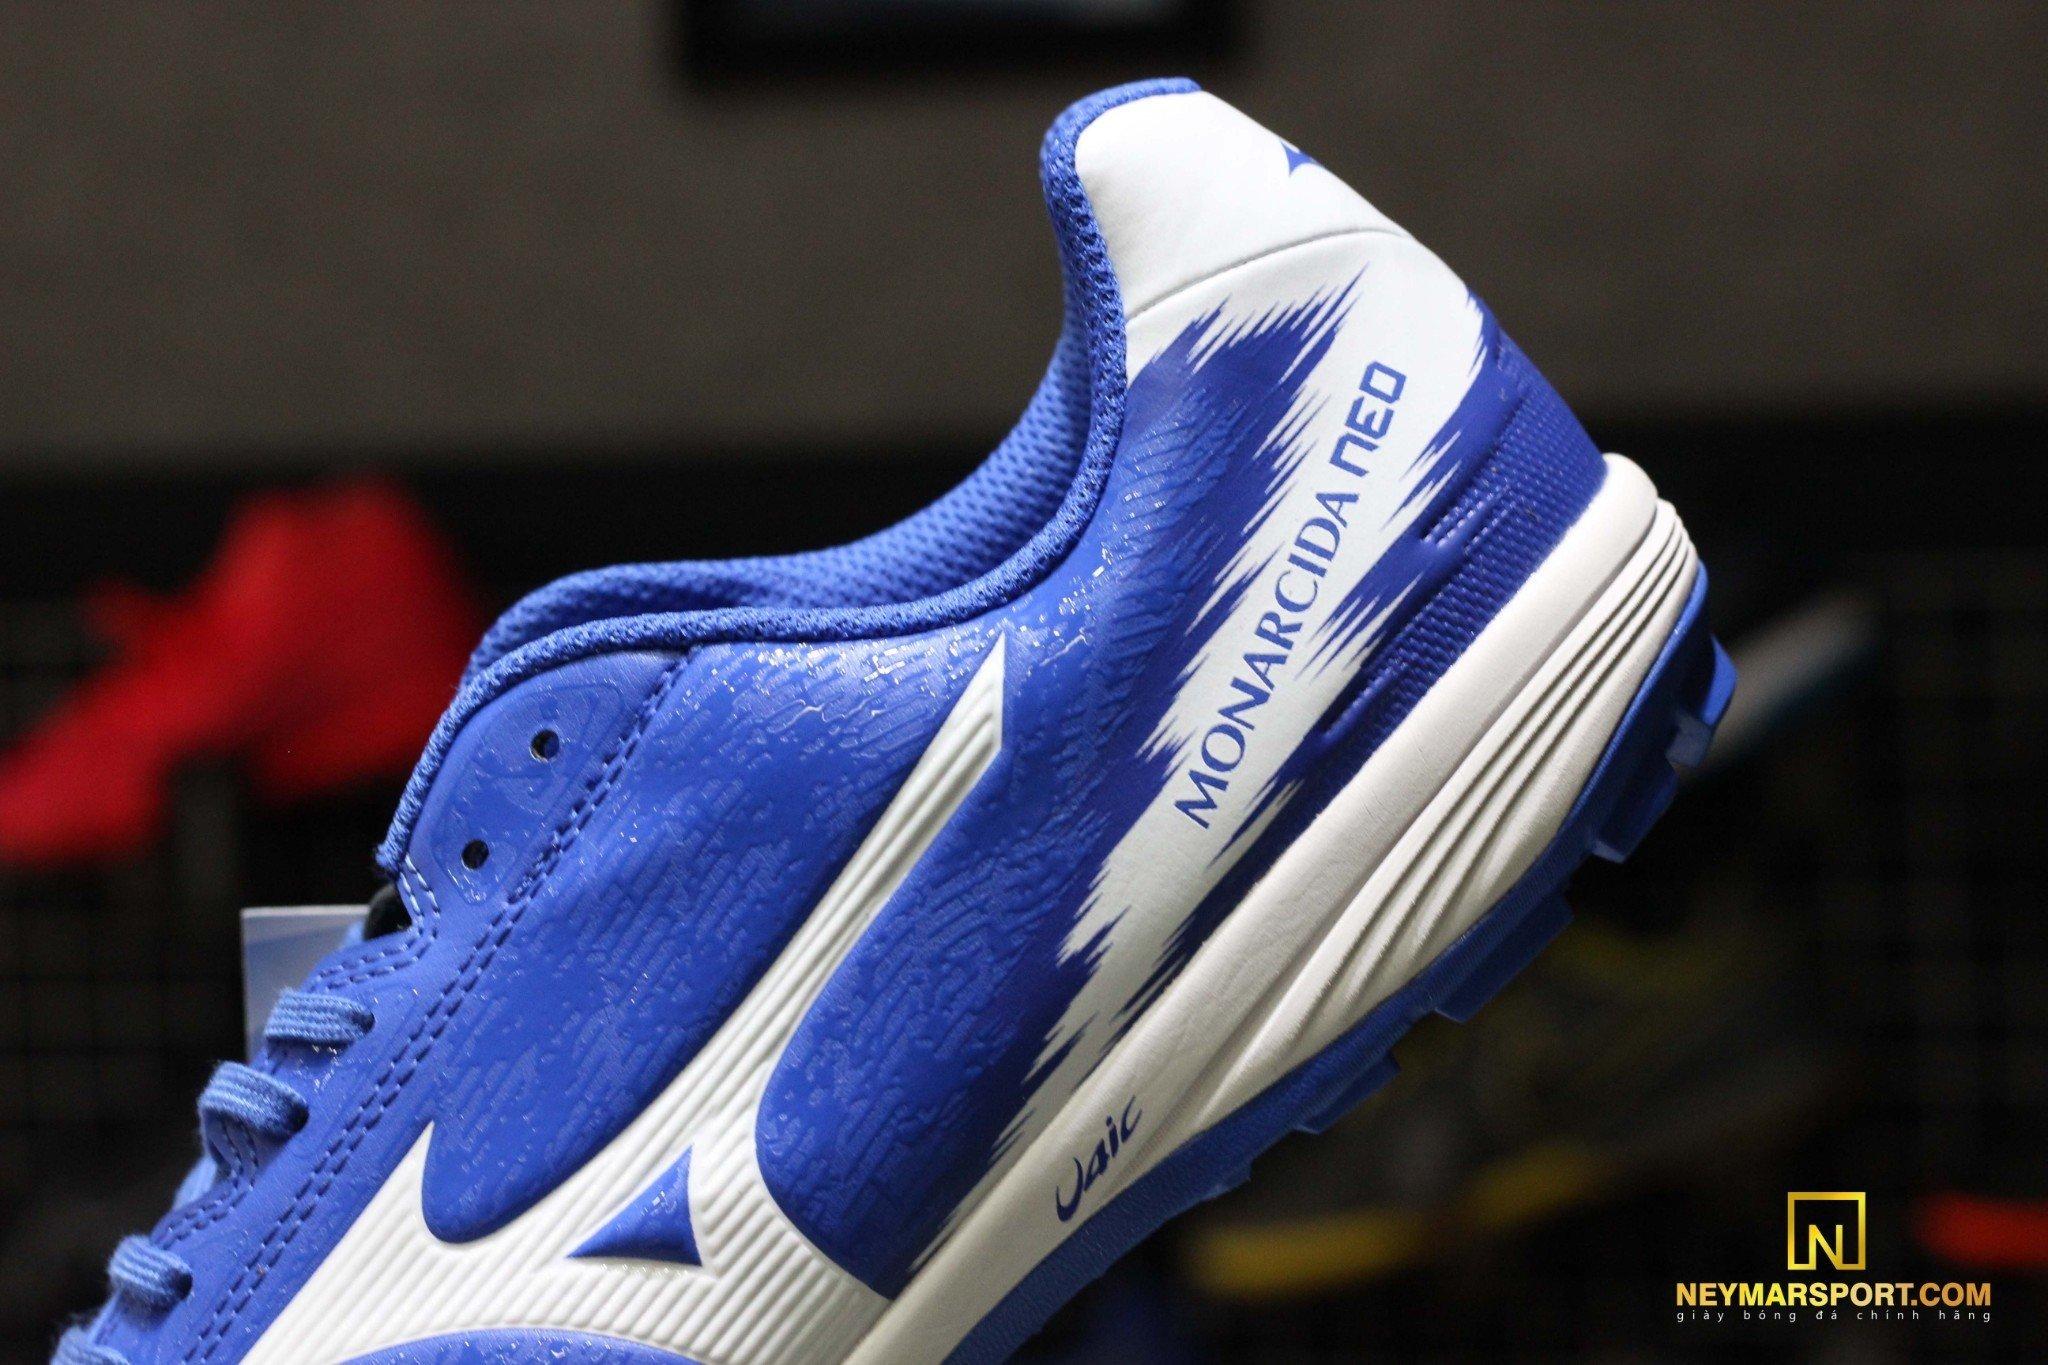 Giày đá banh Mizuno Monarcida Sala Pro TF Blue/White